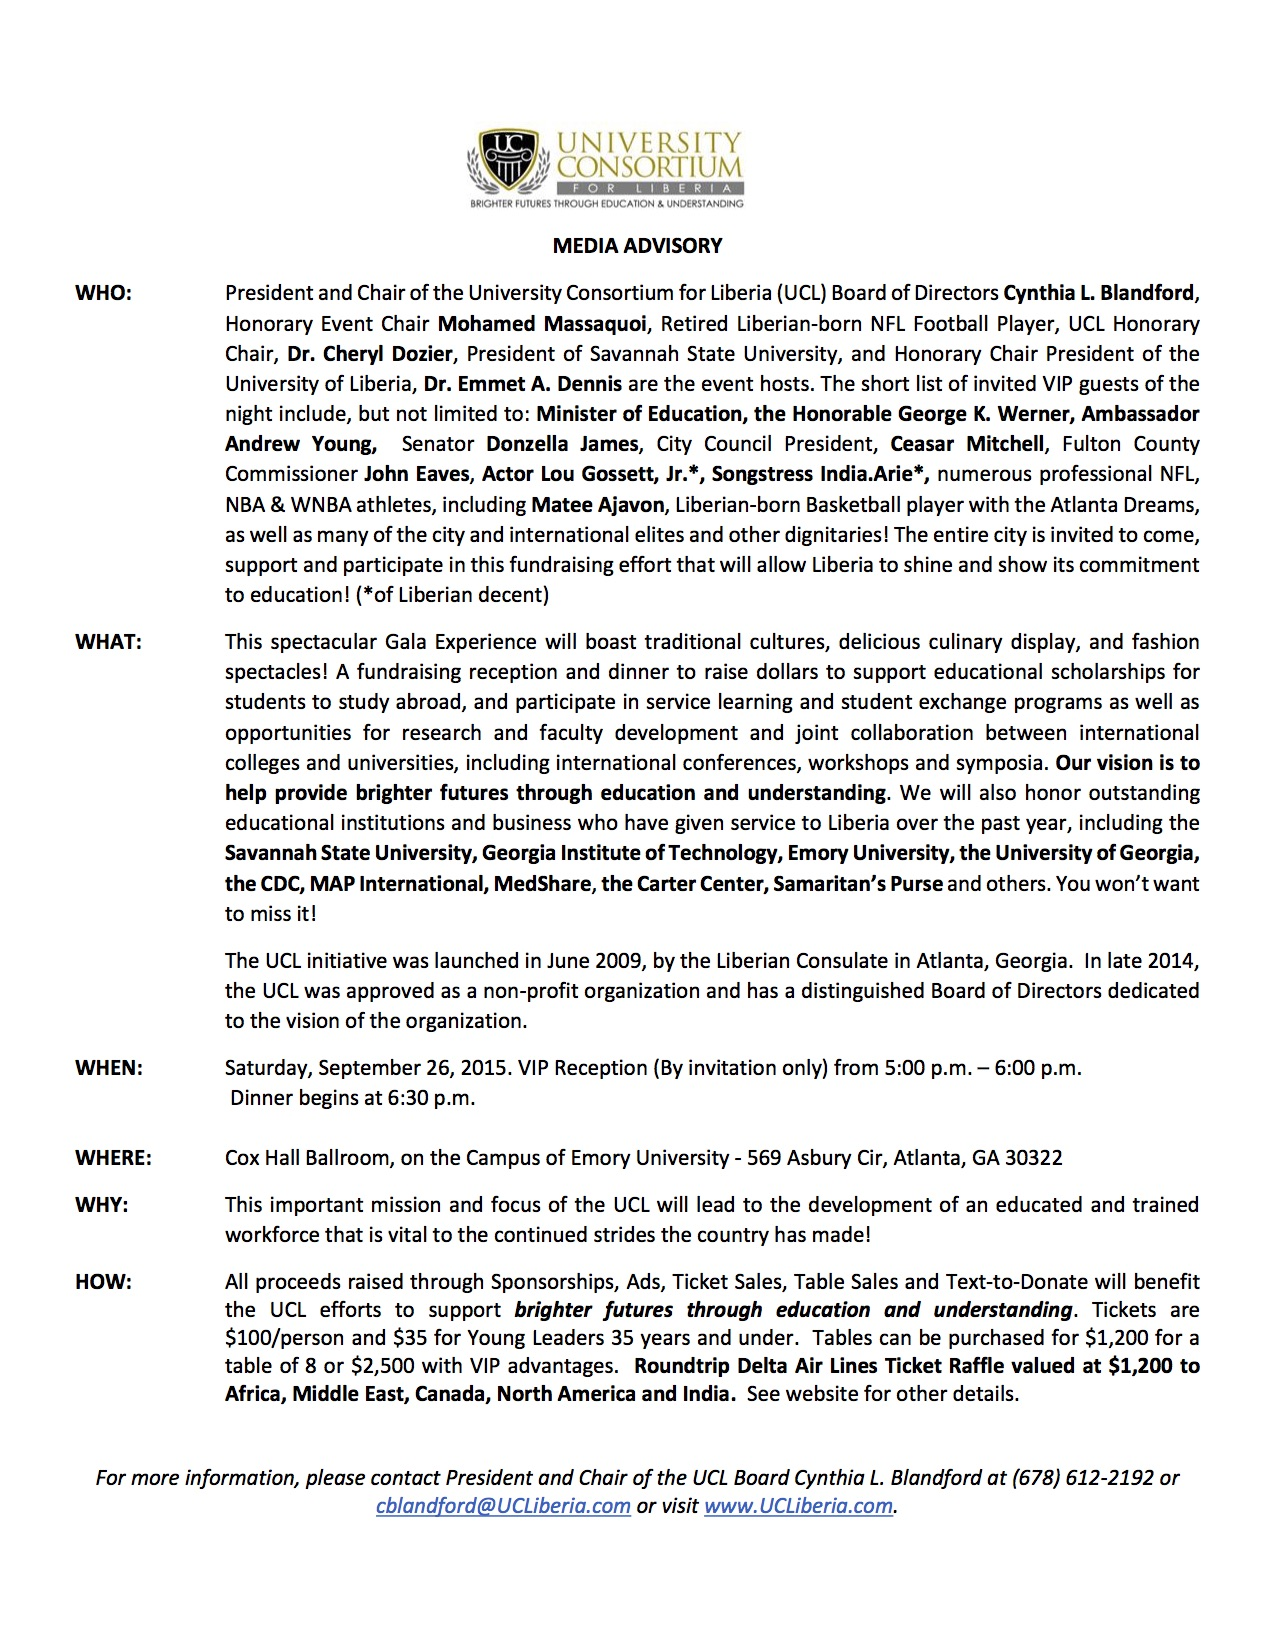 MEDIA ADVISORY UNIVERSITY CONSORTIUM FOR LIBERIA